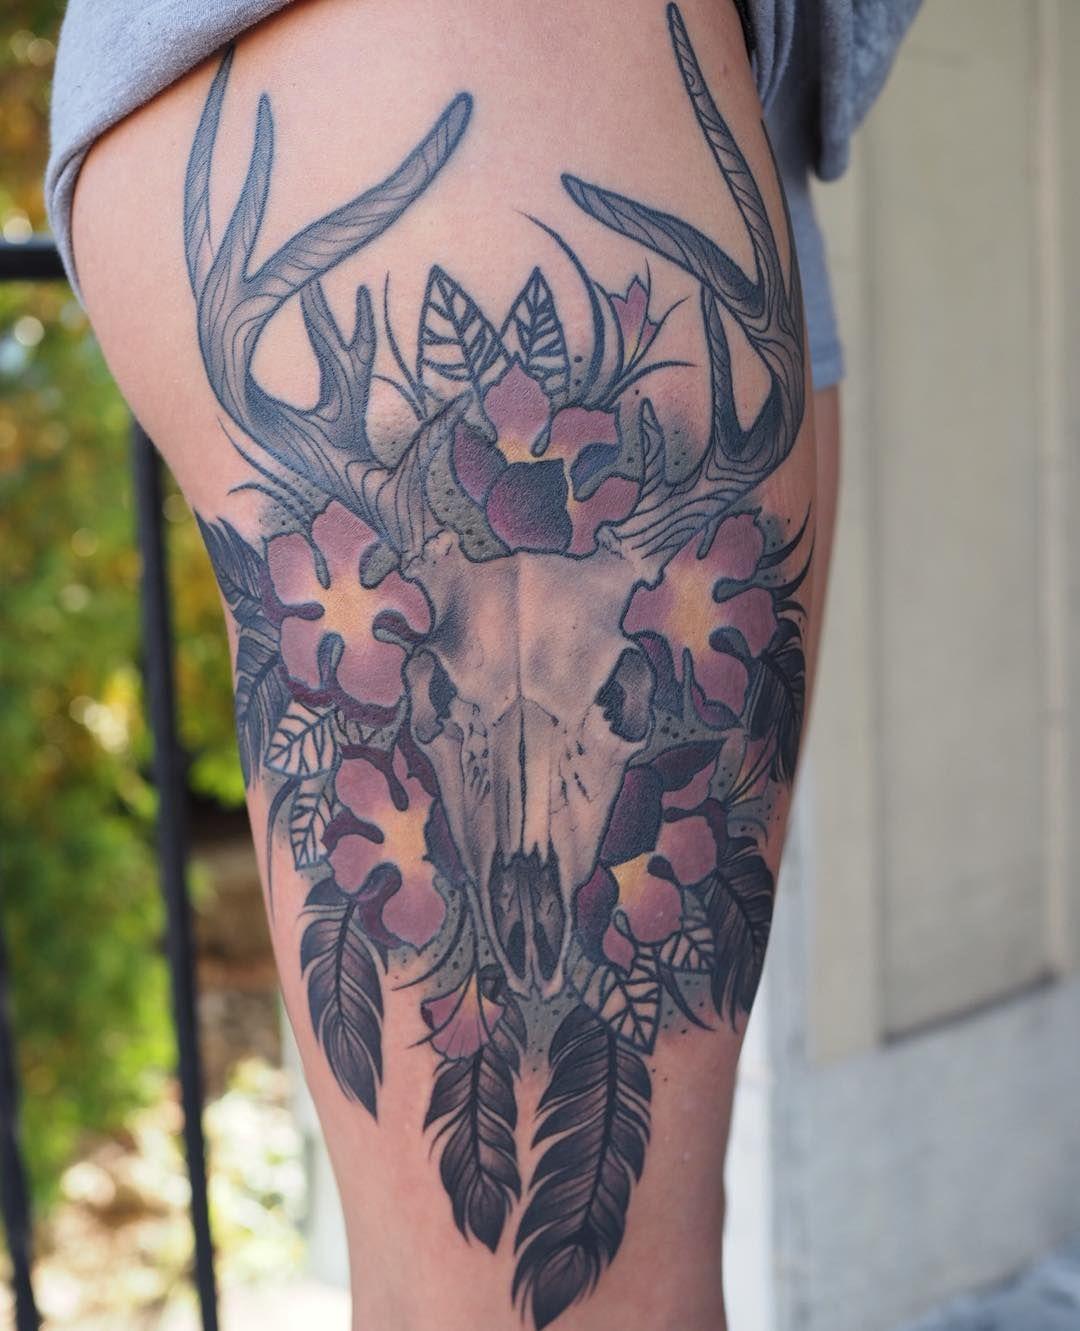 Deer skull tattoos are worn by people for various reasons